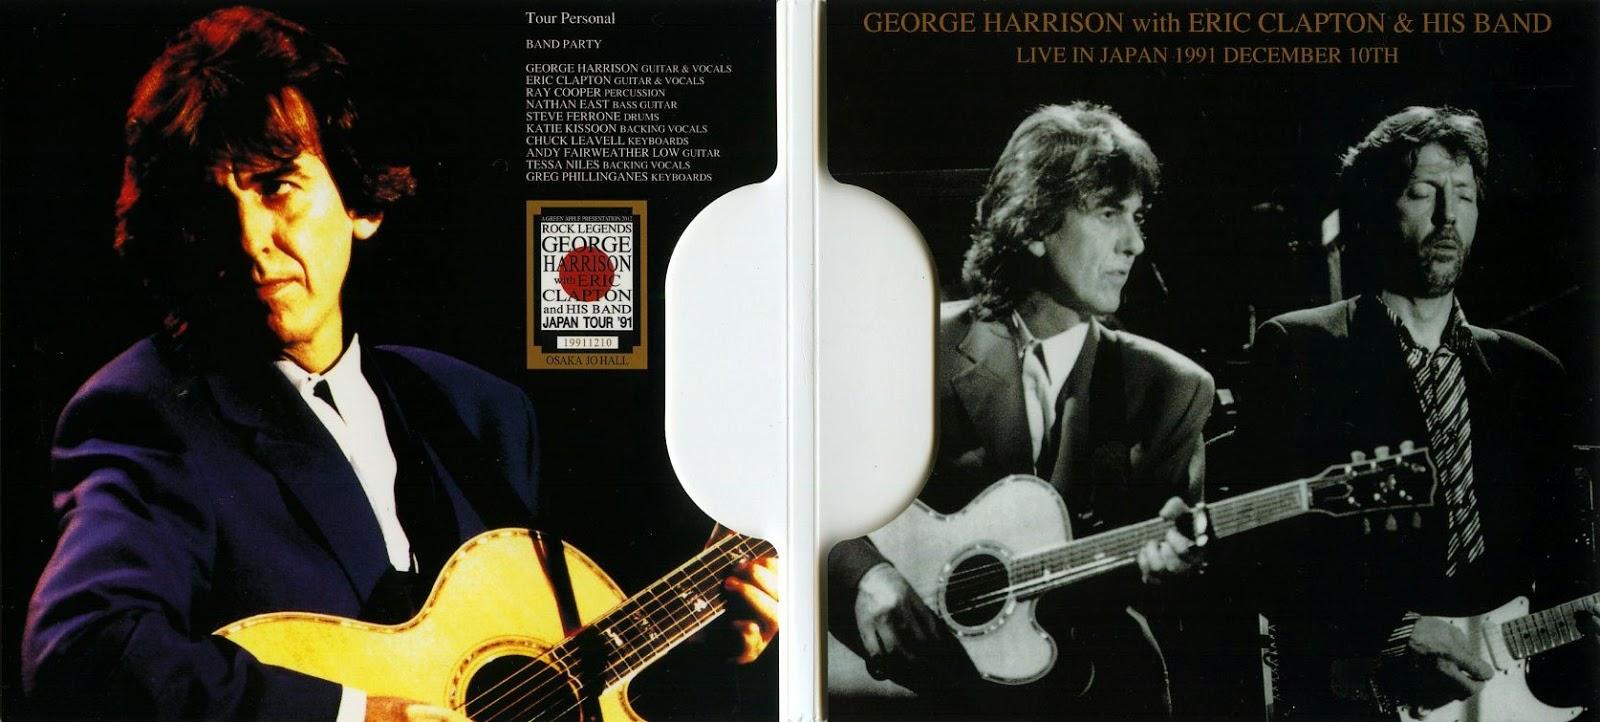 George harrison 1991